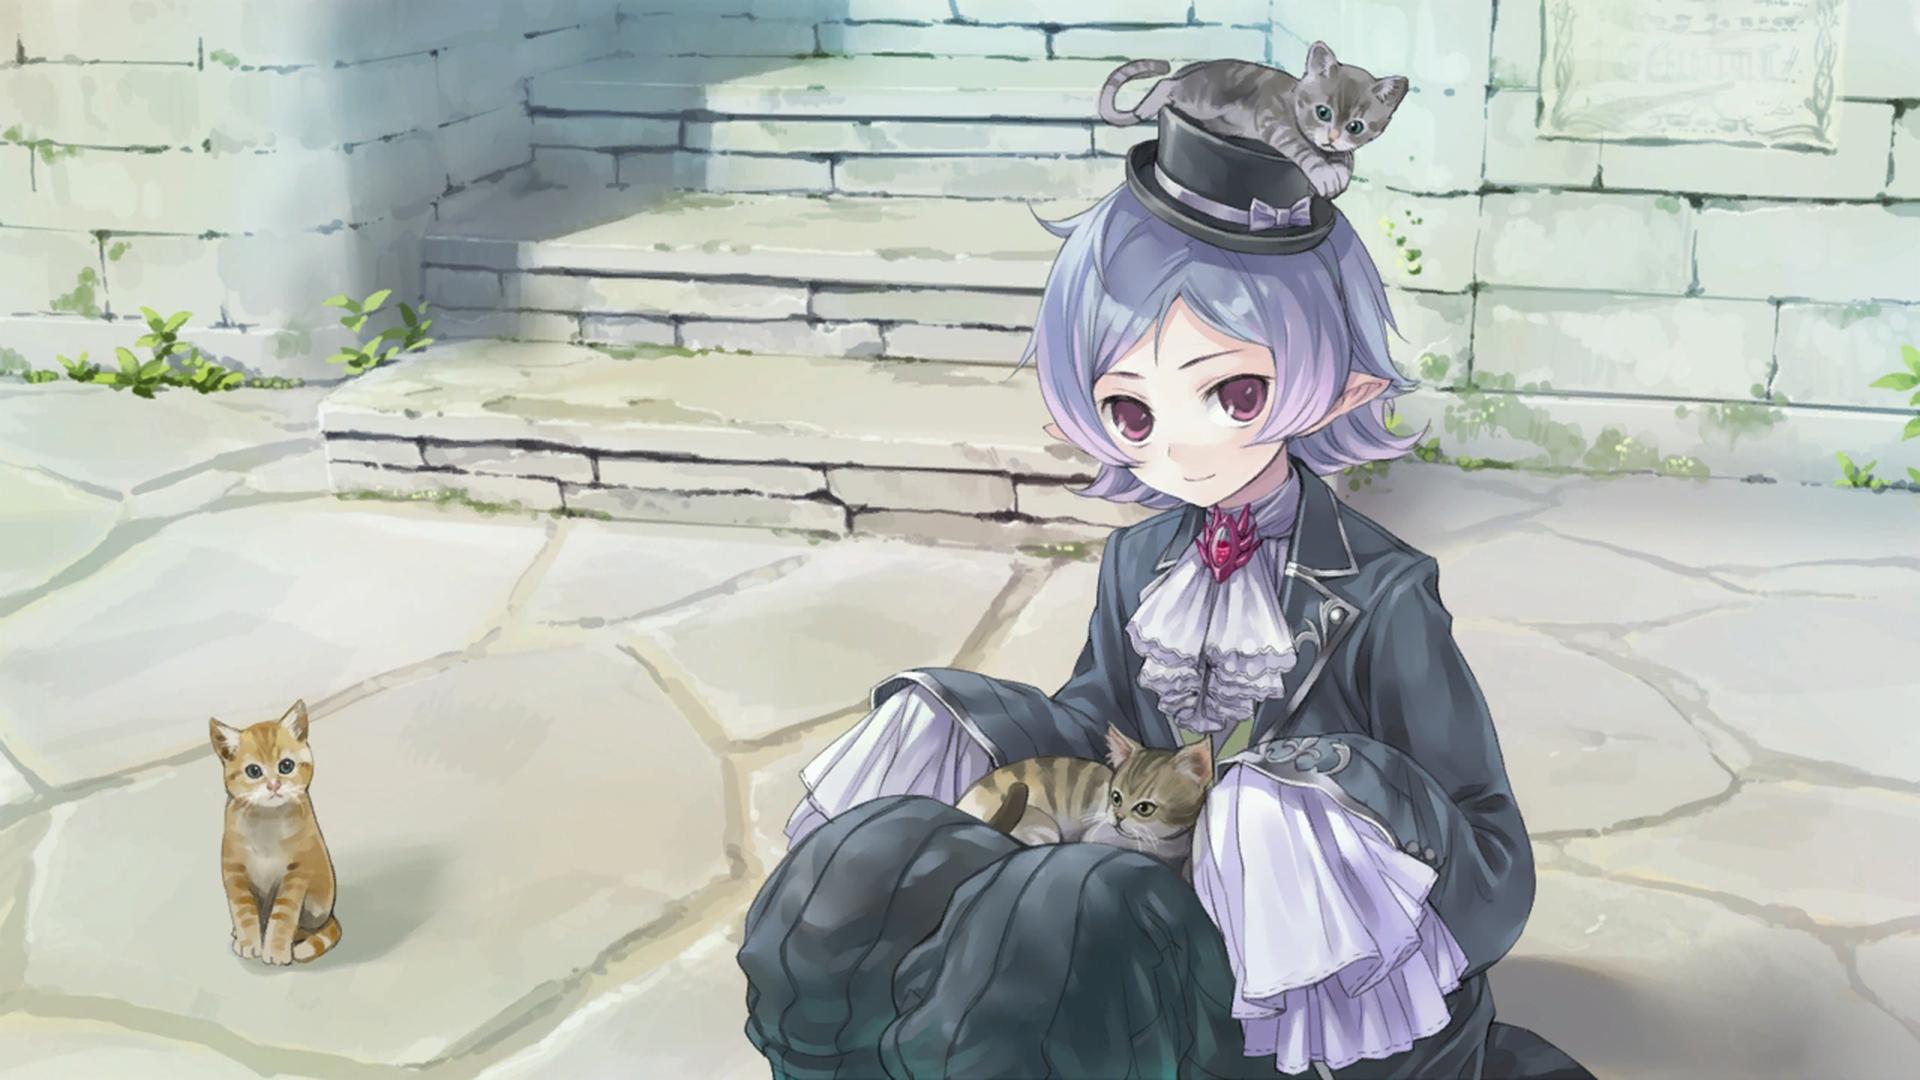 Atelier Rorona The Alchemist of Arland Wallpaper 019